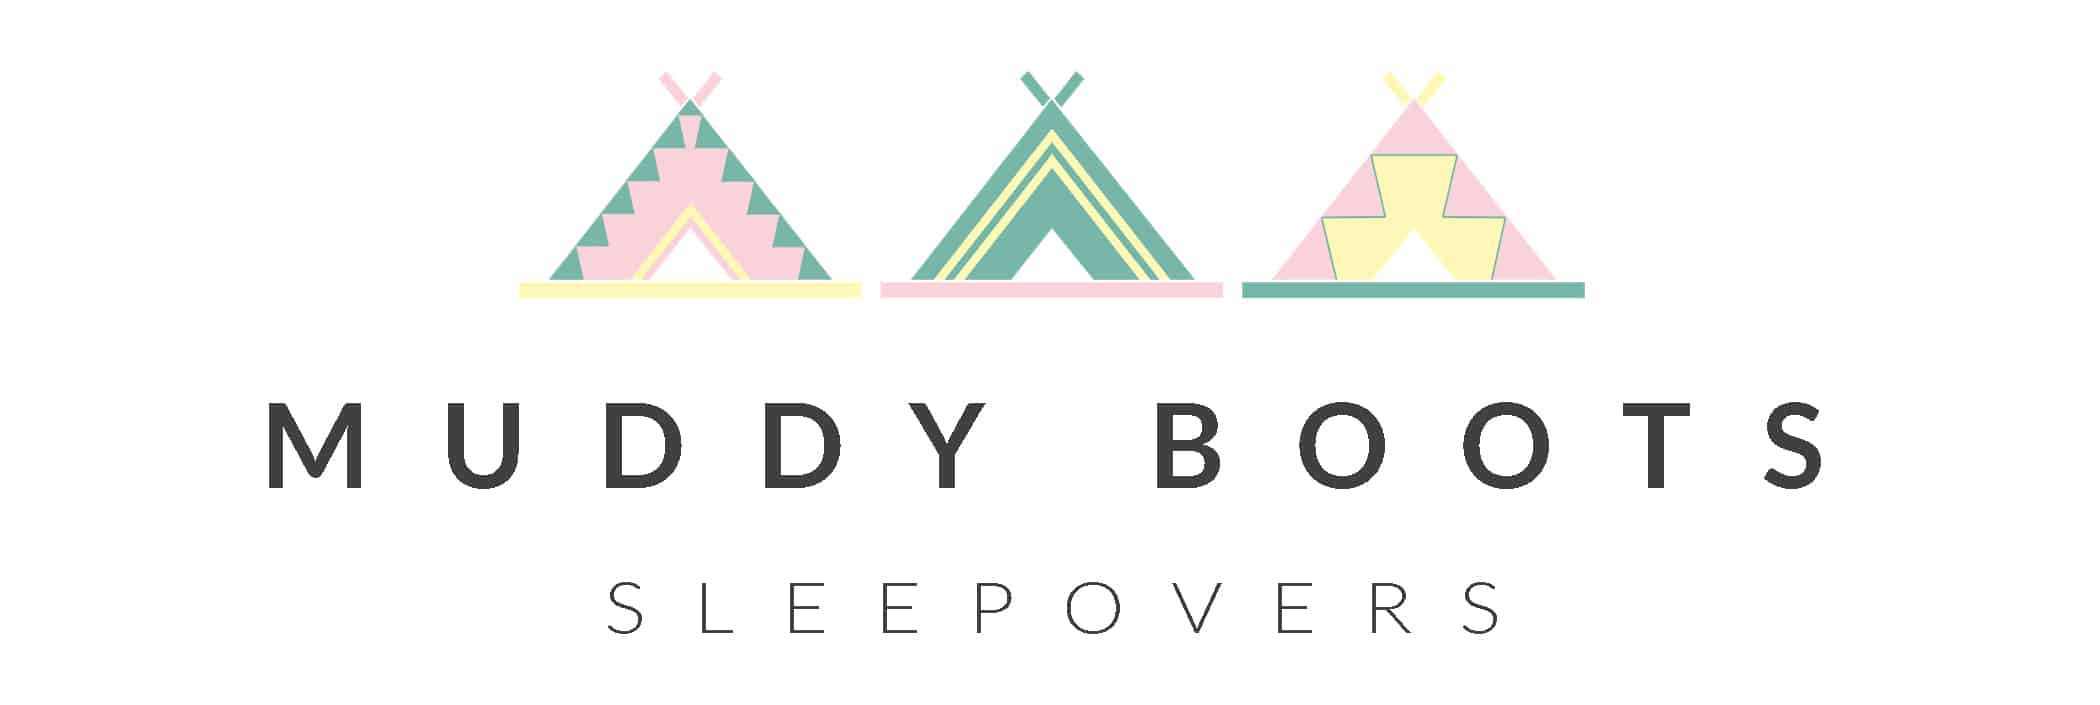 Muddy-Boots-Sleepovers-Logos-2